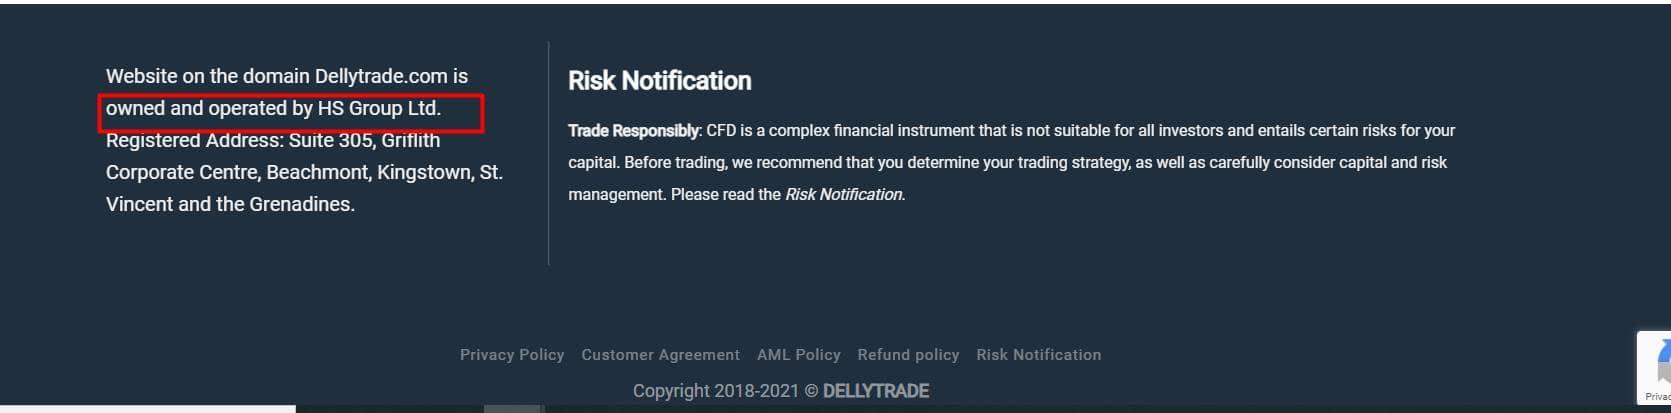 скриншот с сайта DellyTrade